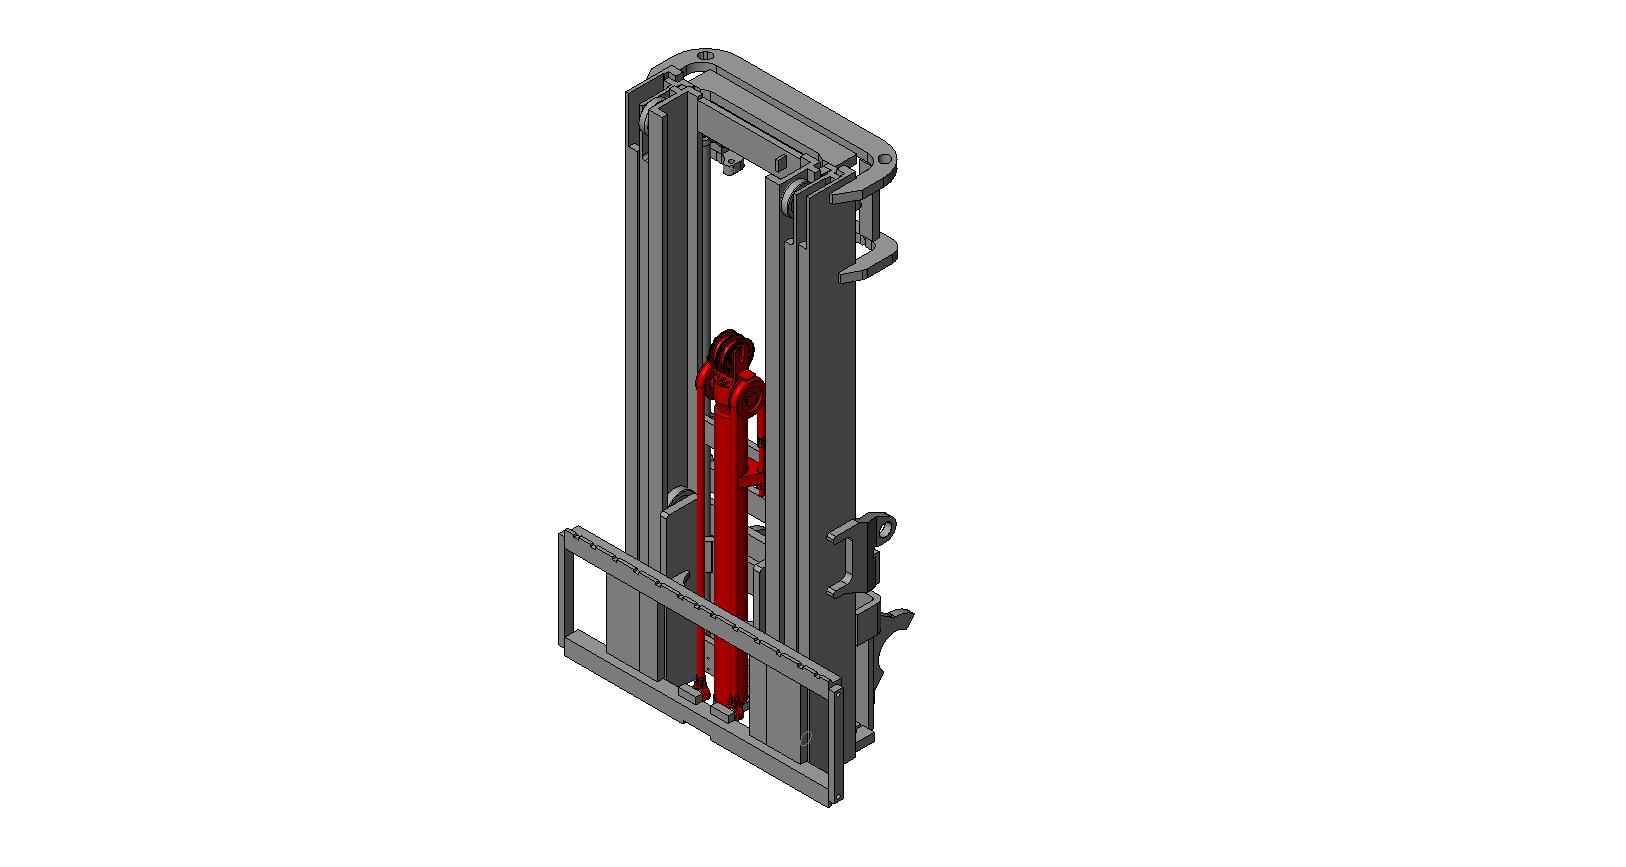 Axon Forklift: Three Stage Mast-2